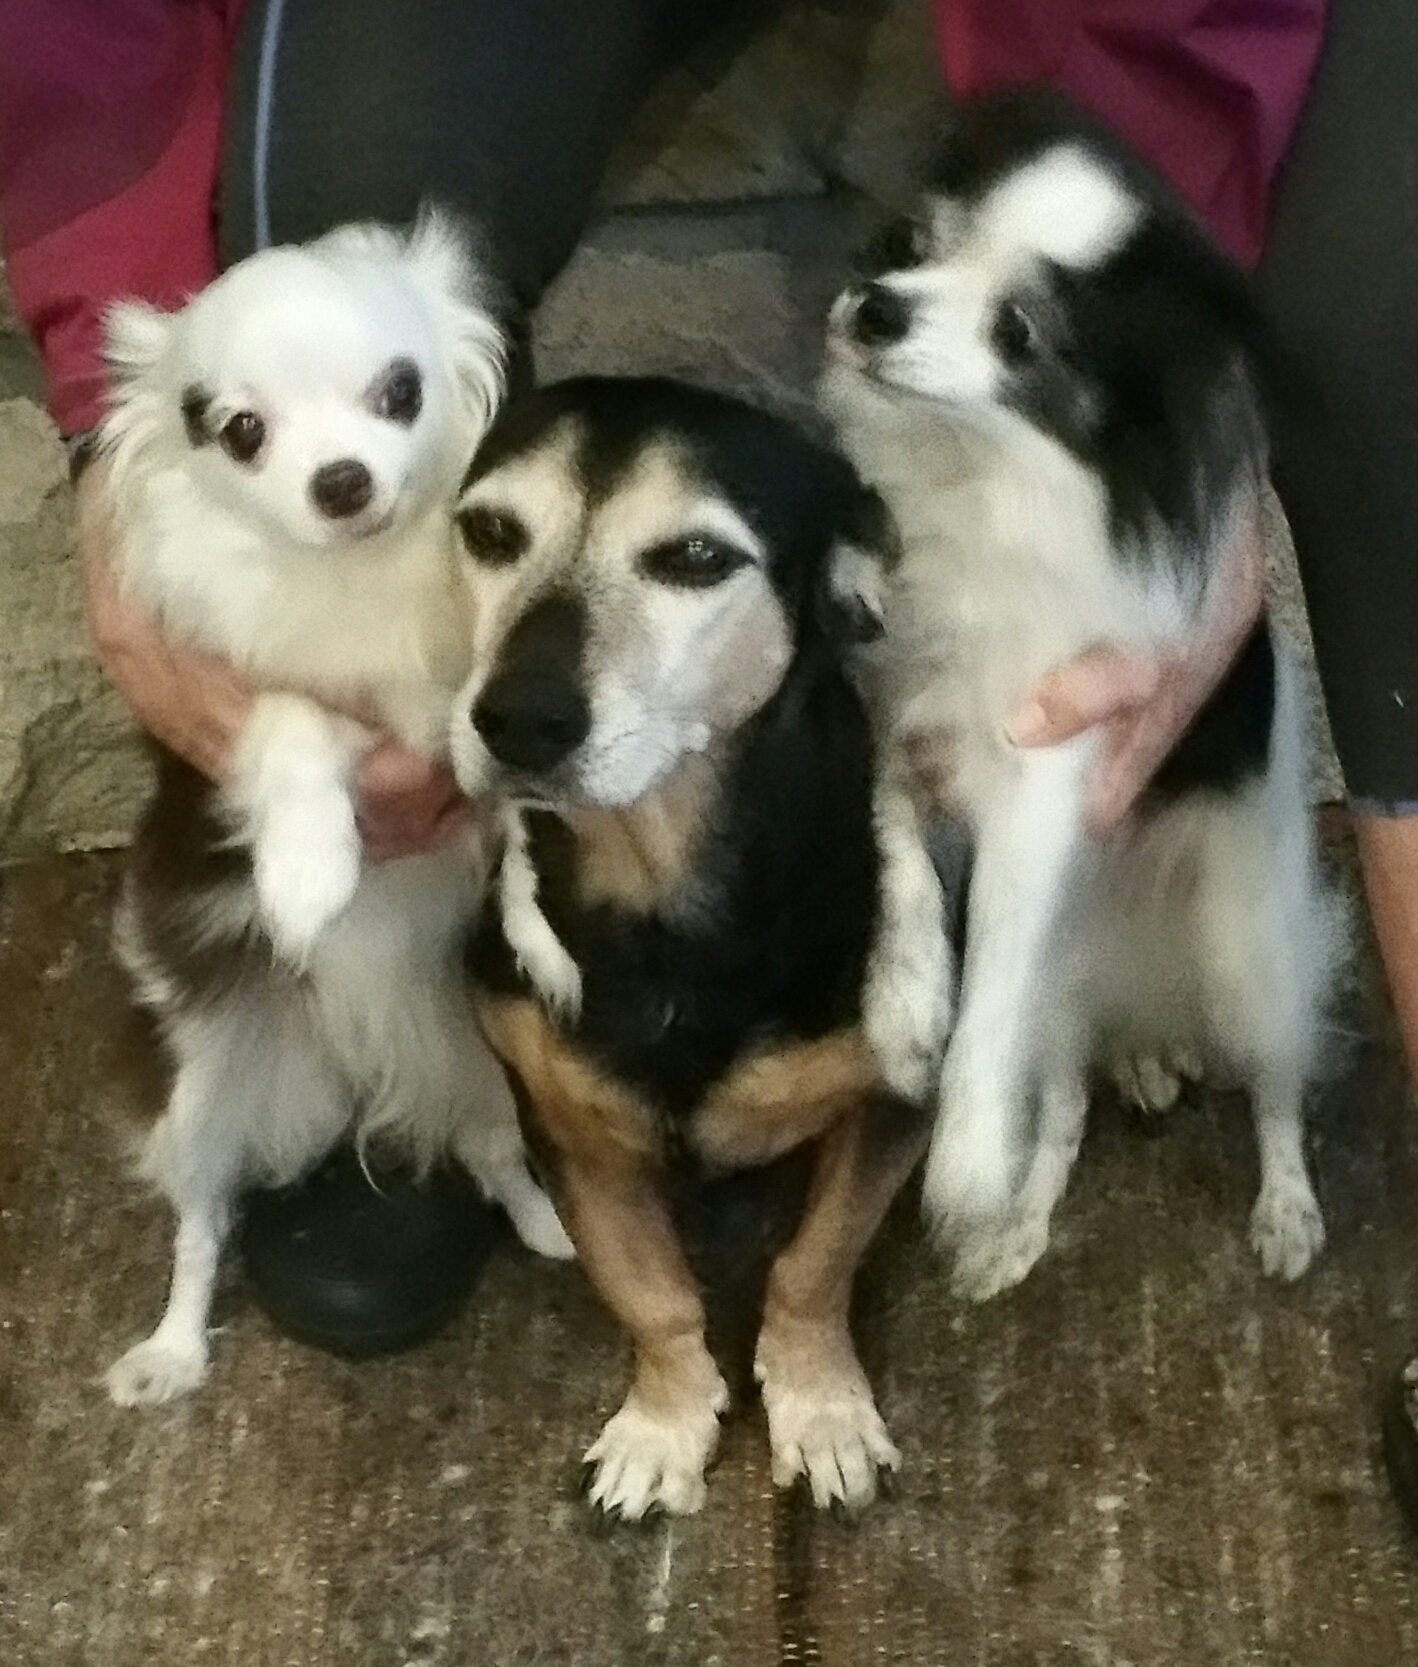 Lola, Zoey & Zsa Zsa